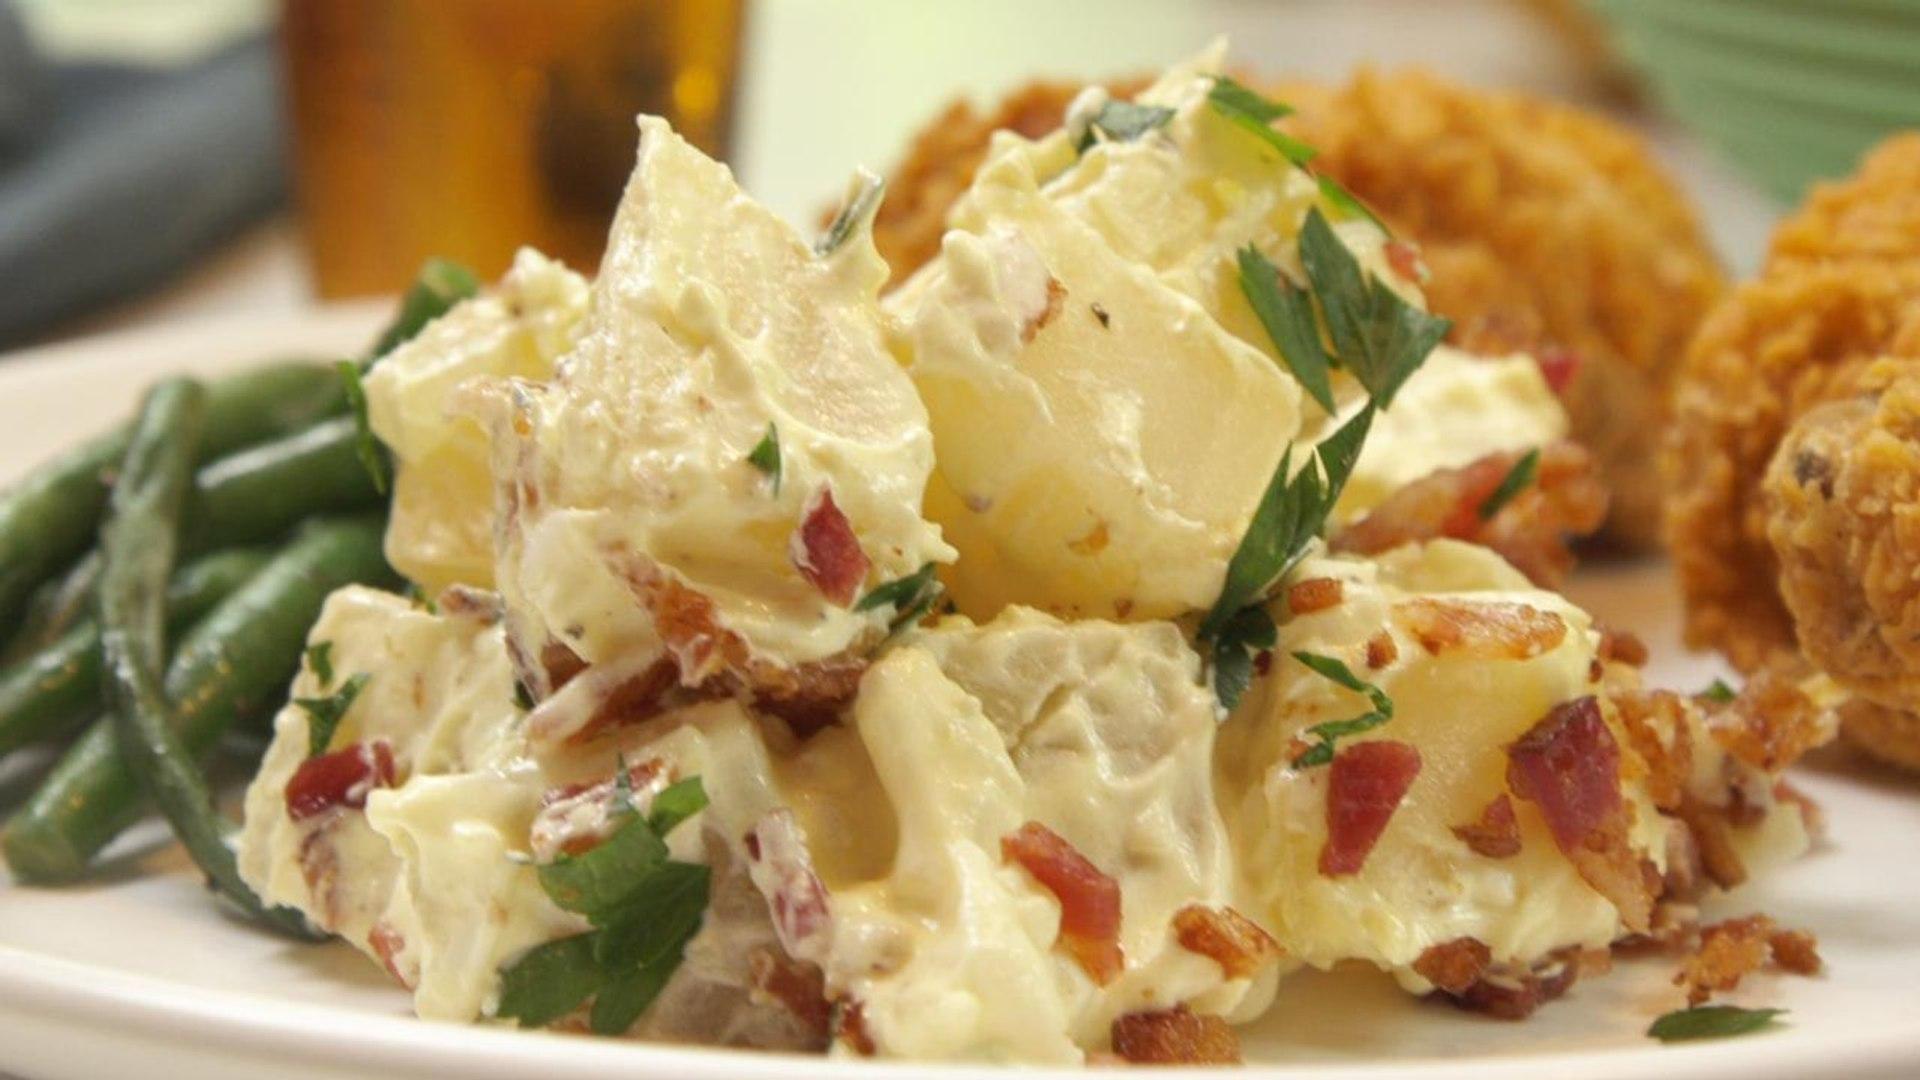 How to Make Southern Style Potato Salad